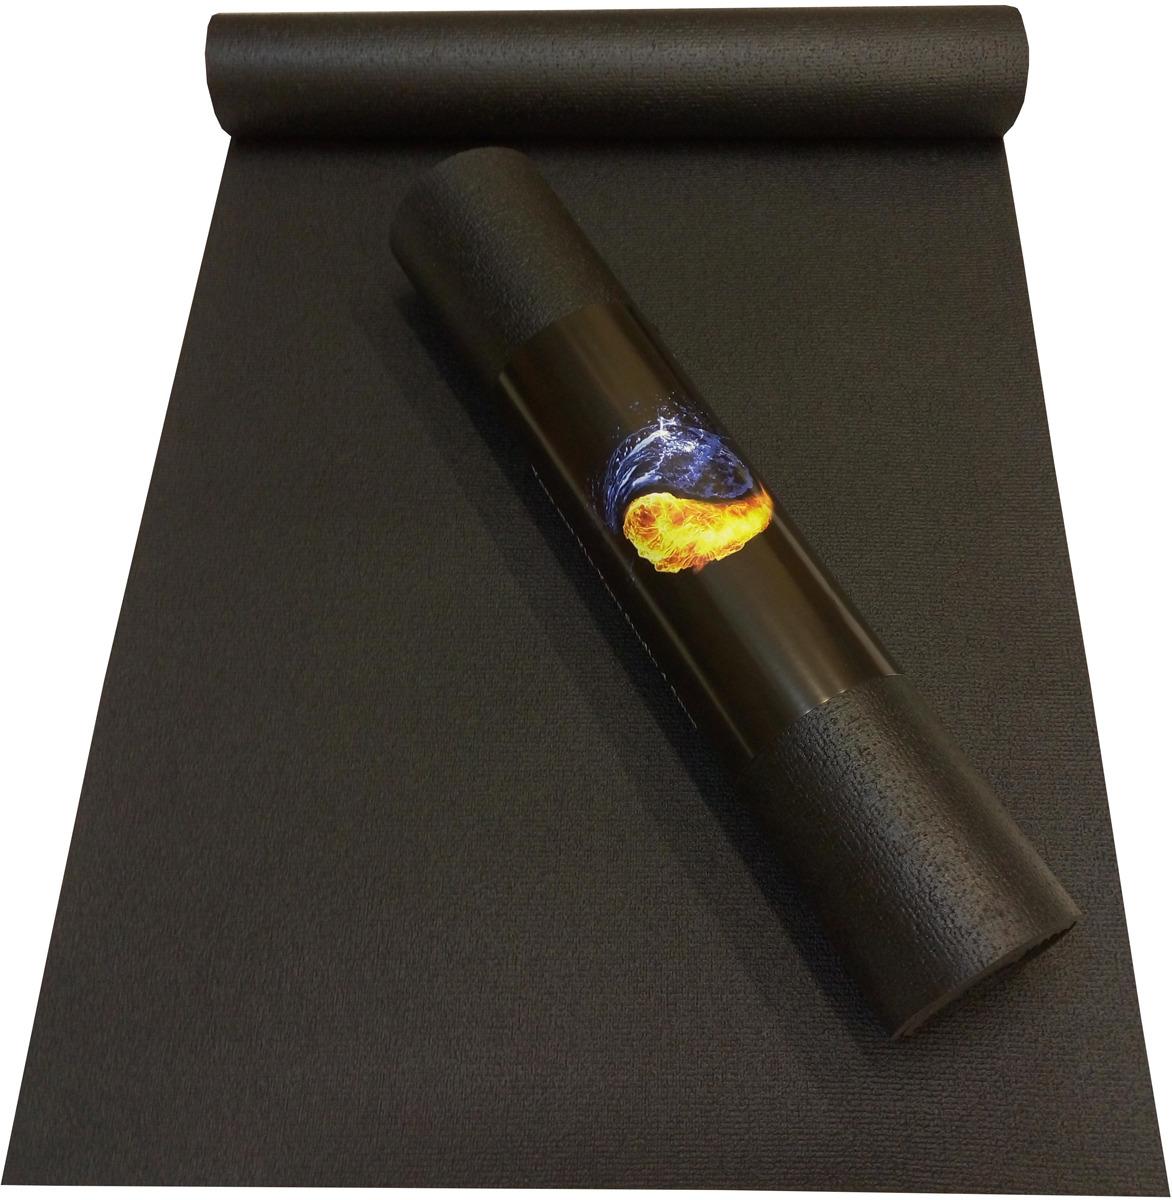 Коврик для йоги Ako-Yoga Yin-Yang Studio, цвет: черный, 200 х 80 см коврик для йоги ako yoga yin yang studio цвет синий 185 х 60 х 0 45 см